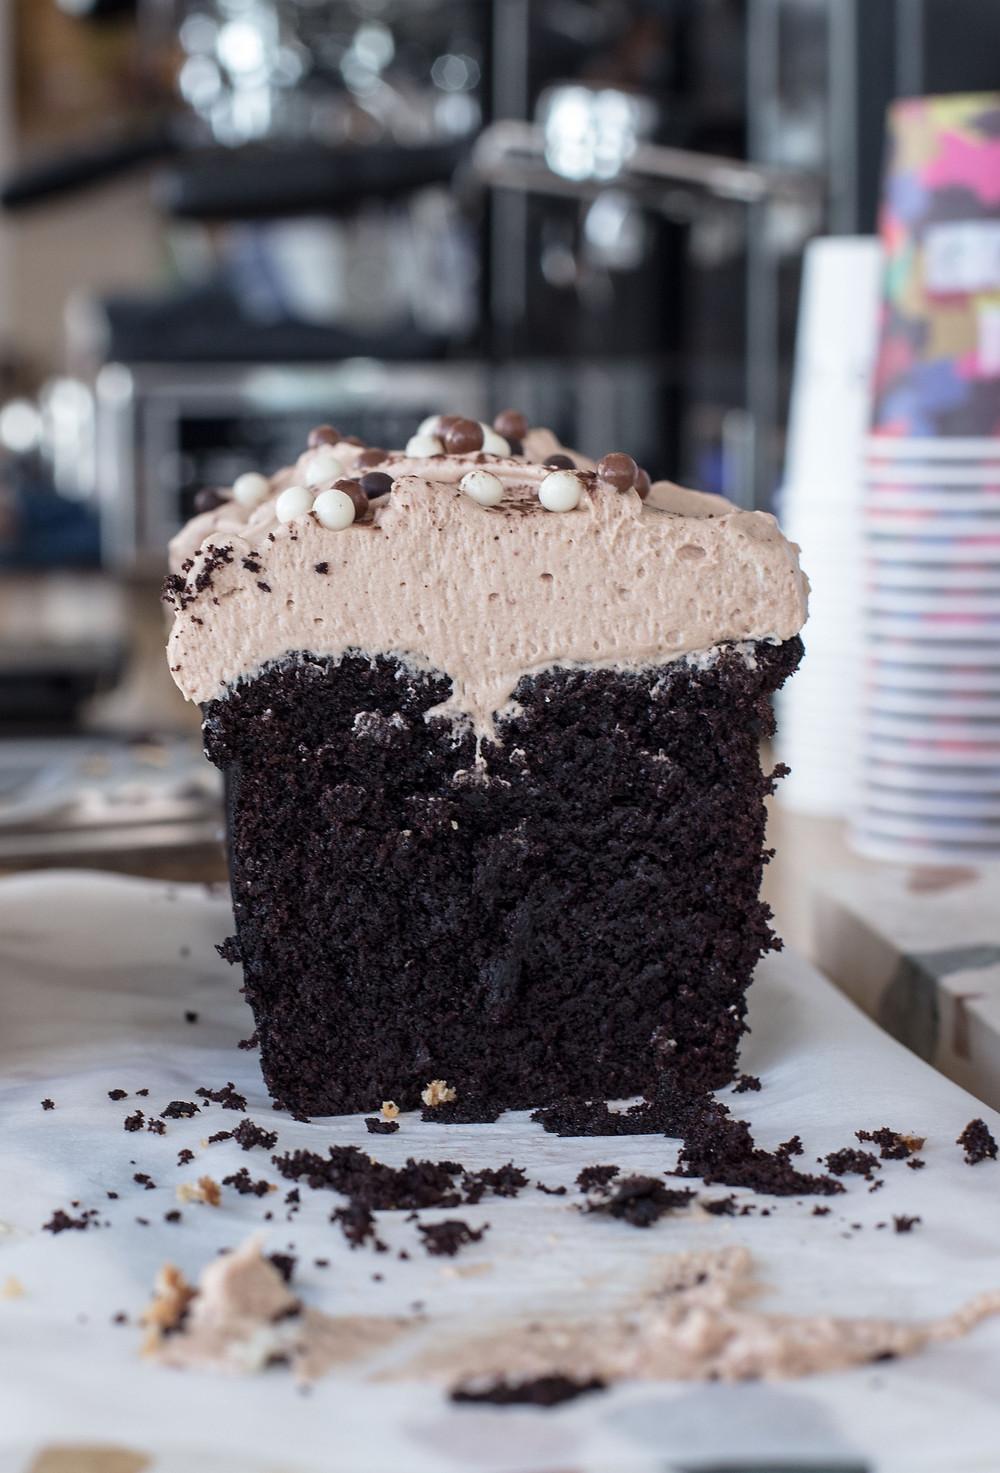 Joko visits coffee bar Toki in Amsterdam and enjoys this yummie chocolate cake